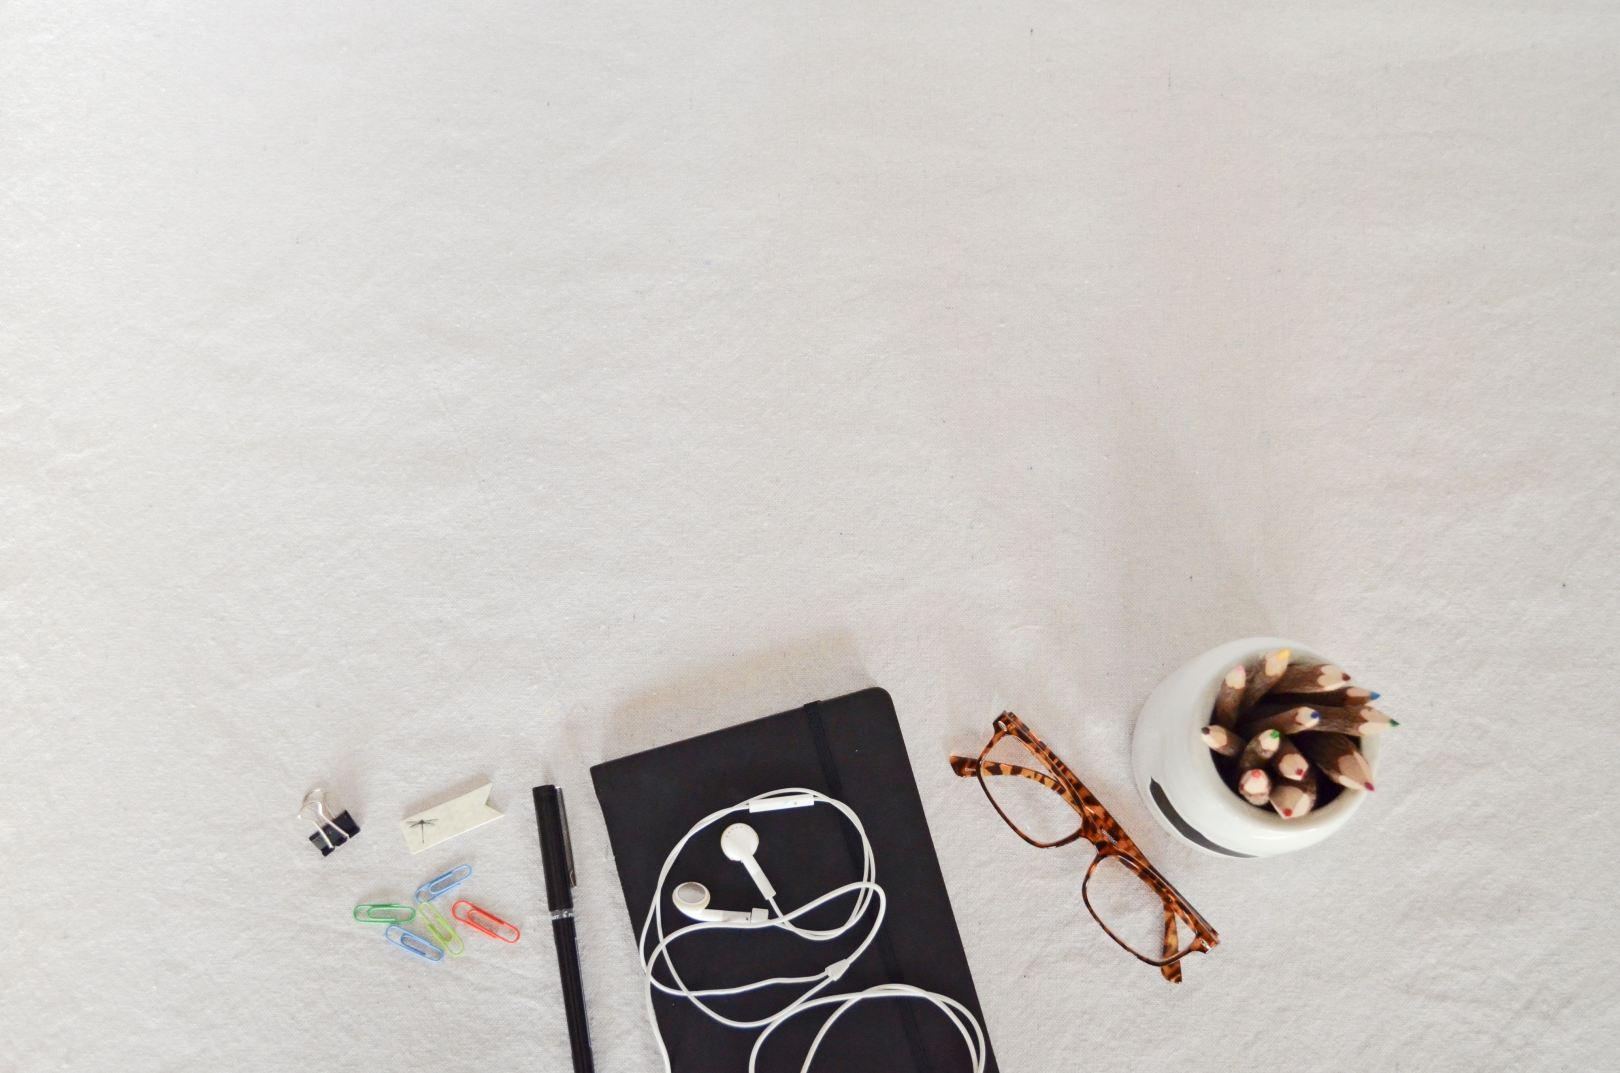 white desk notebook earbuds glasses pencils